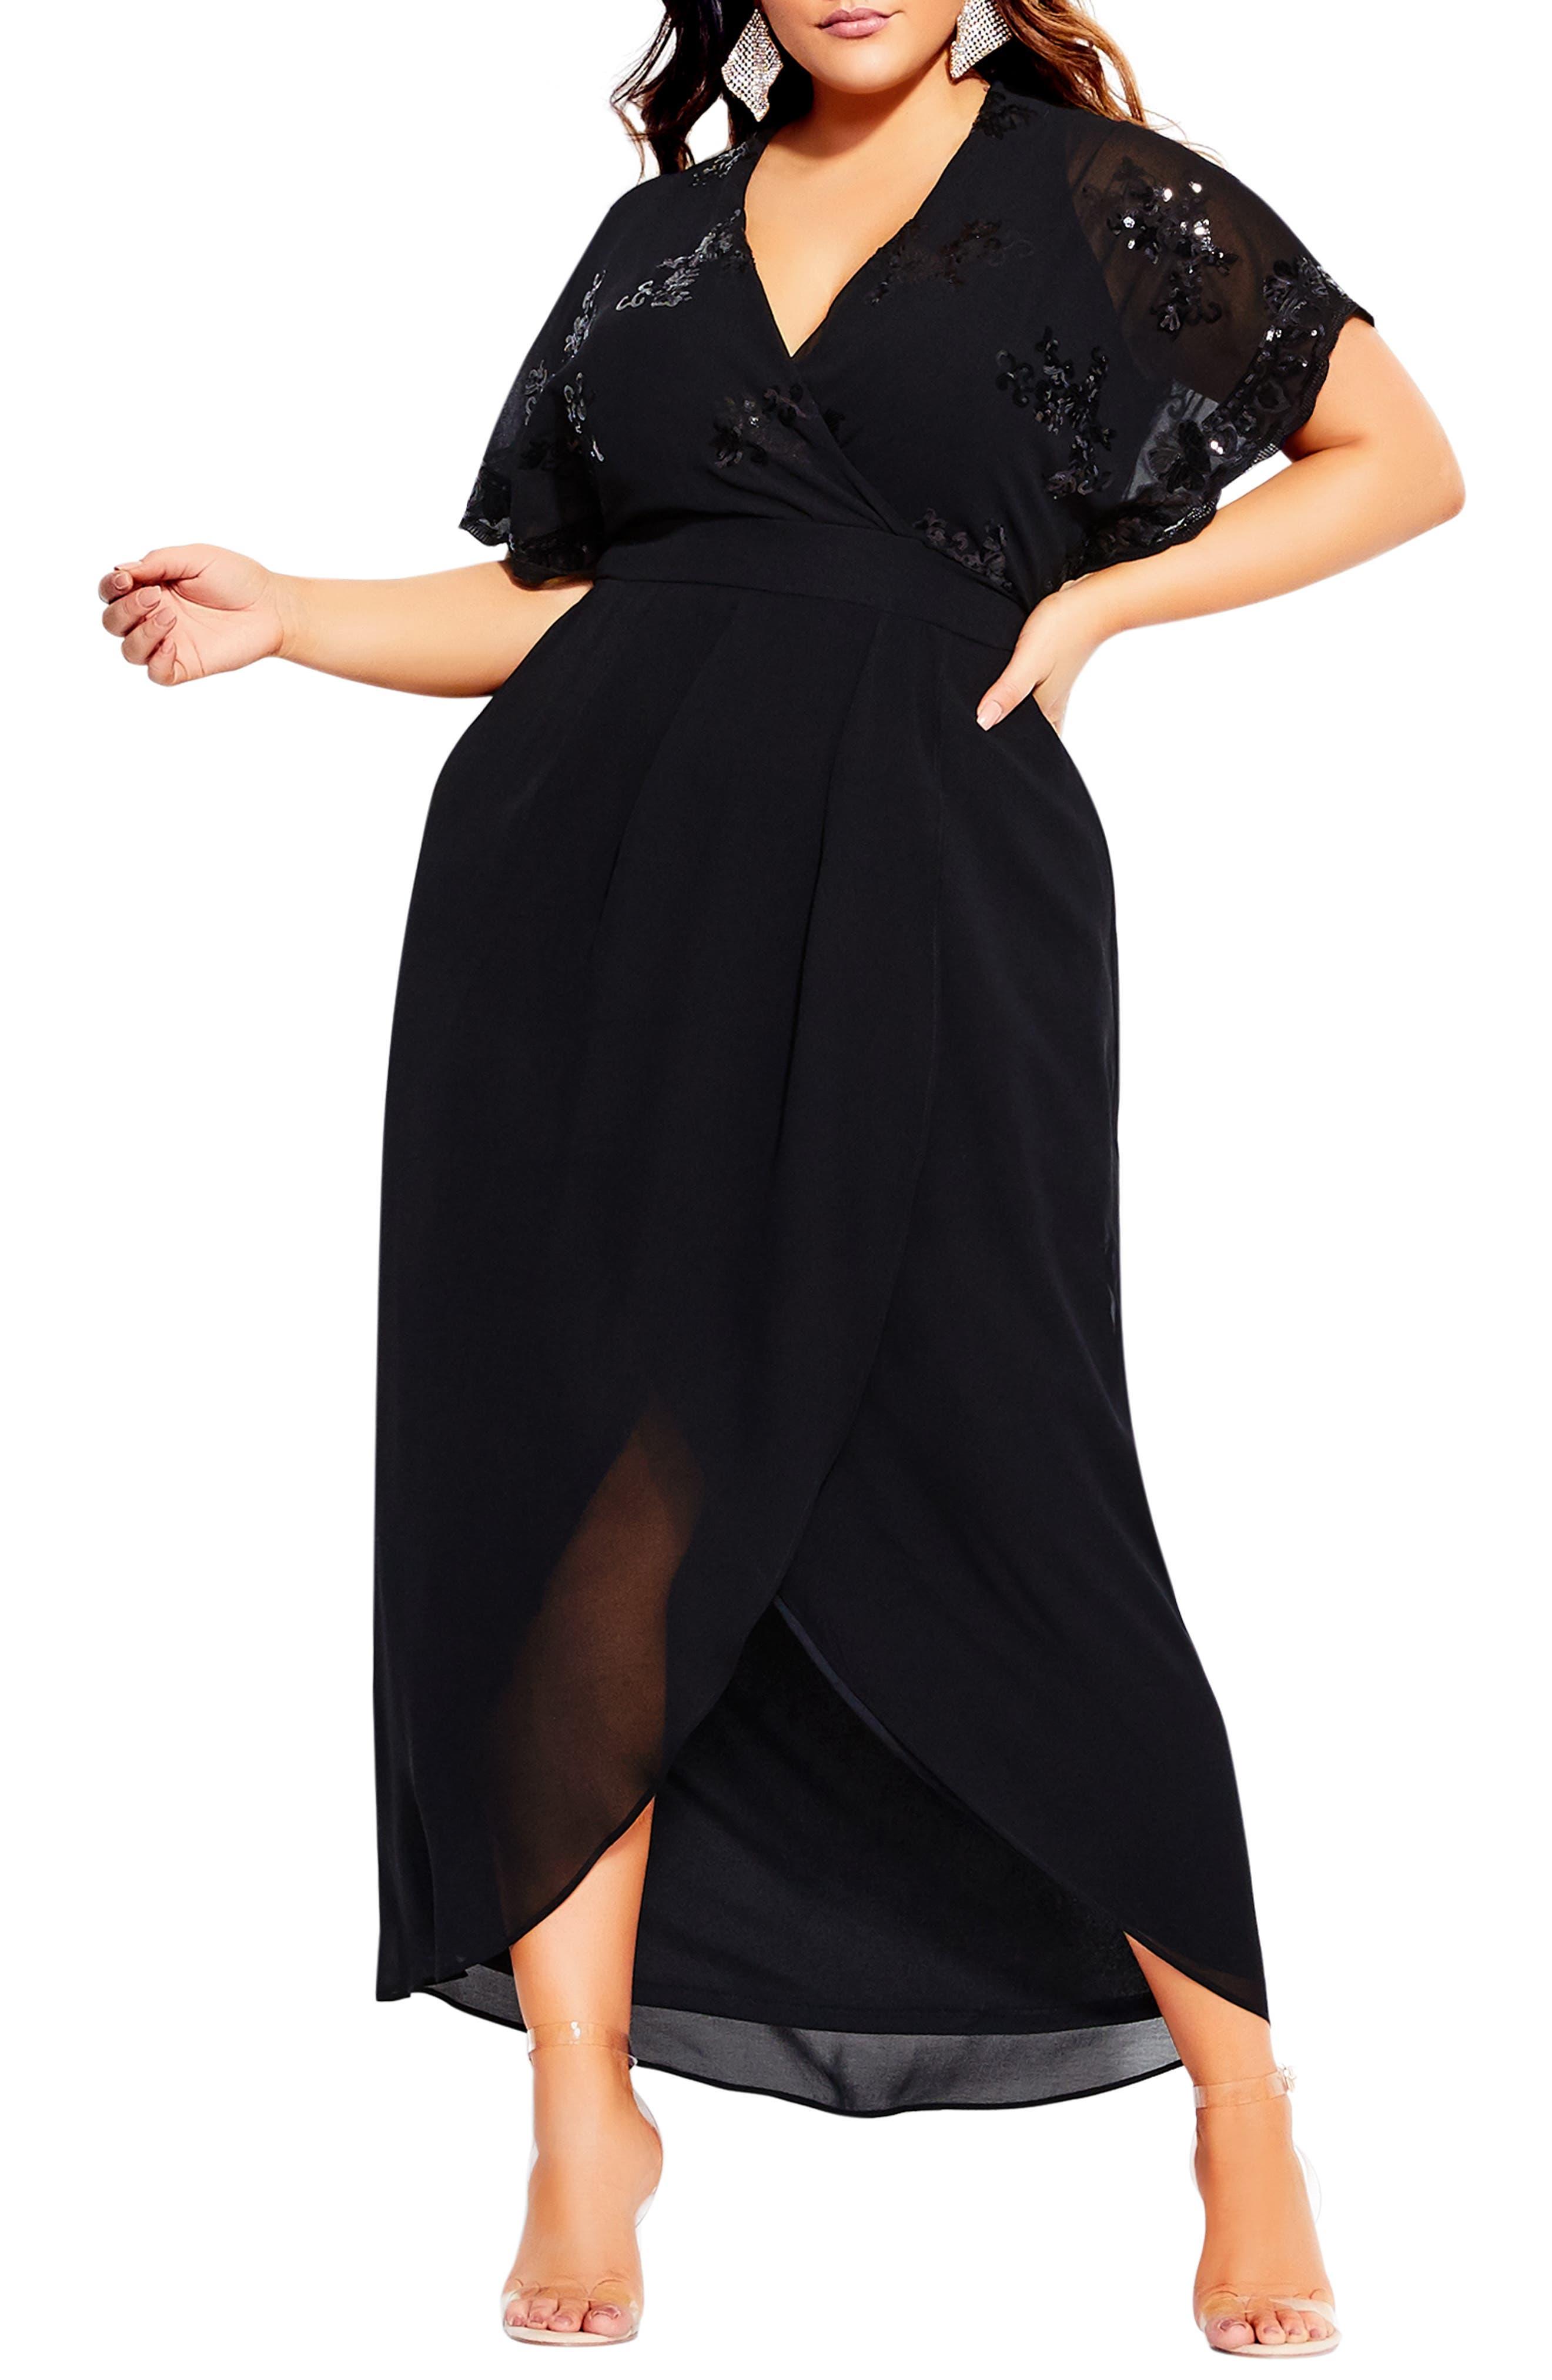 70s Outfits – 70s Style Ideas for Women Plus Size Womens City Chic Sequin Bodice Faux Wrap Maxi Dress $139.00 AT vintagedancer.com